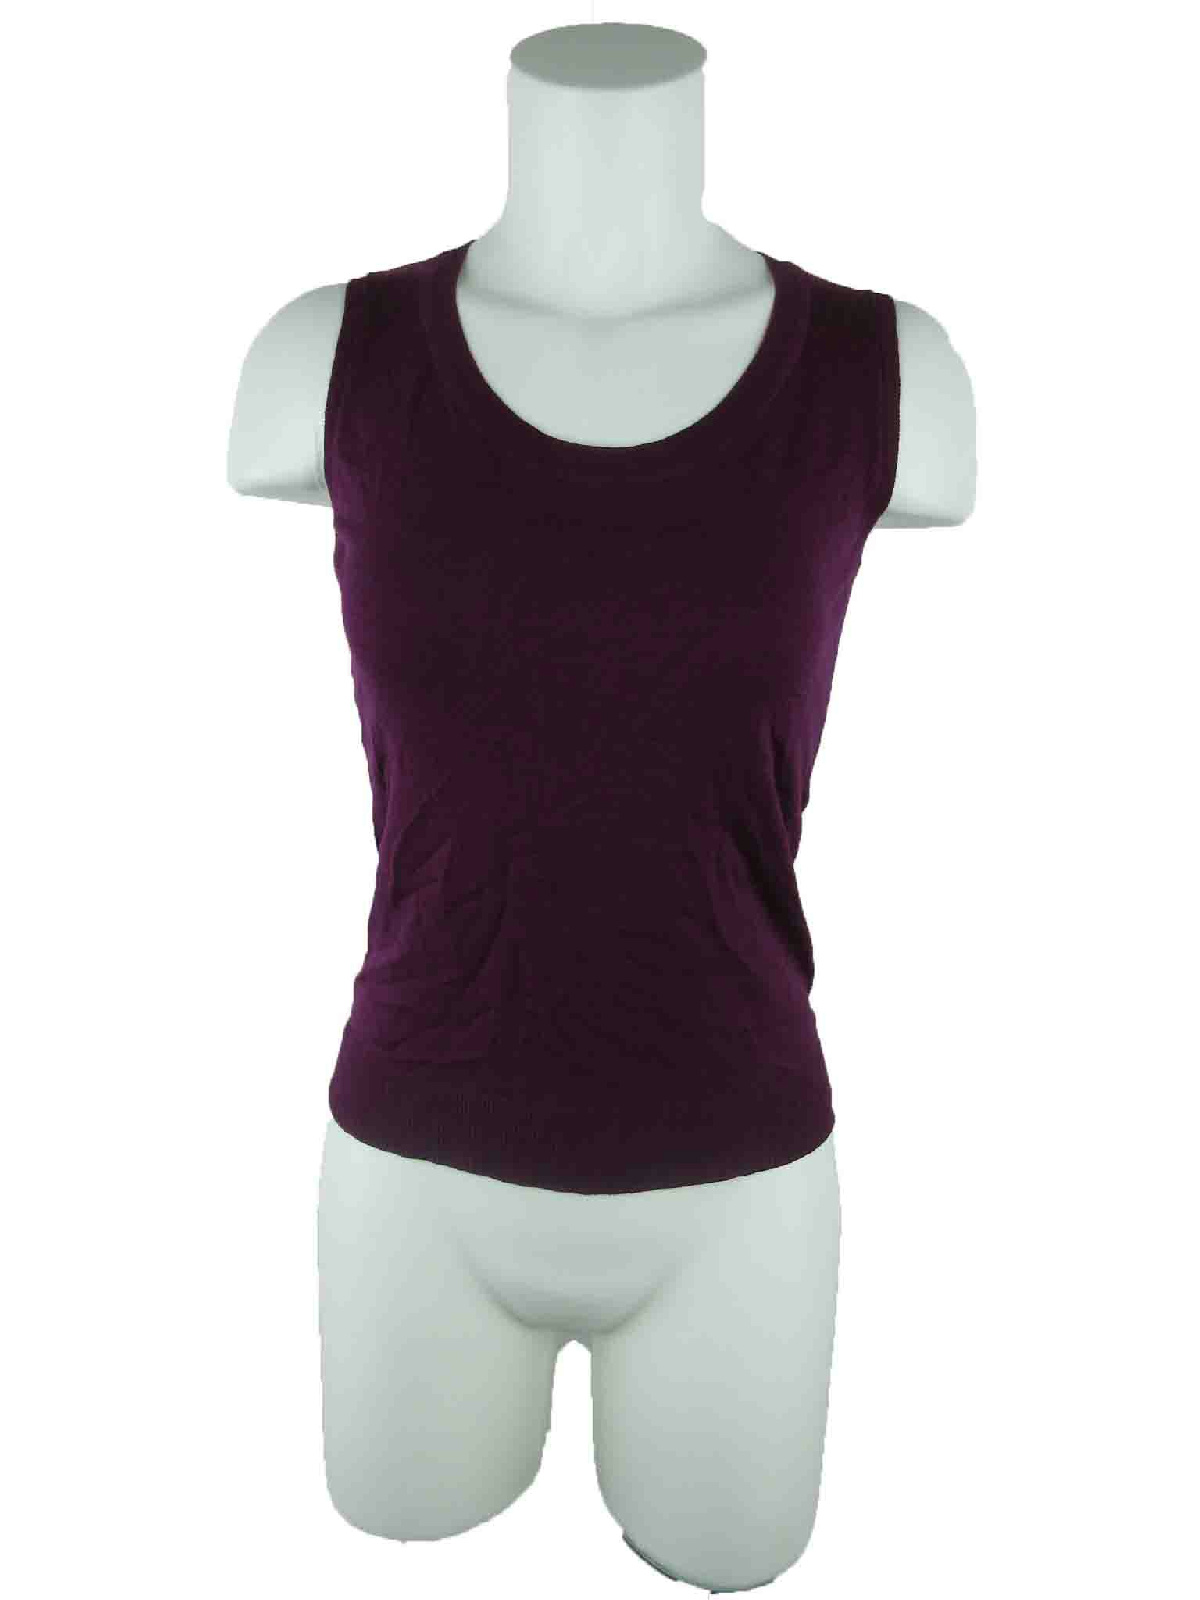 949cbc1473324 August Silk Women s sz XS Crewnexk Viscose Blend Vest Purple Pullover  Sweater